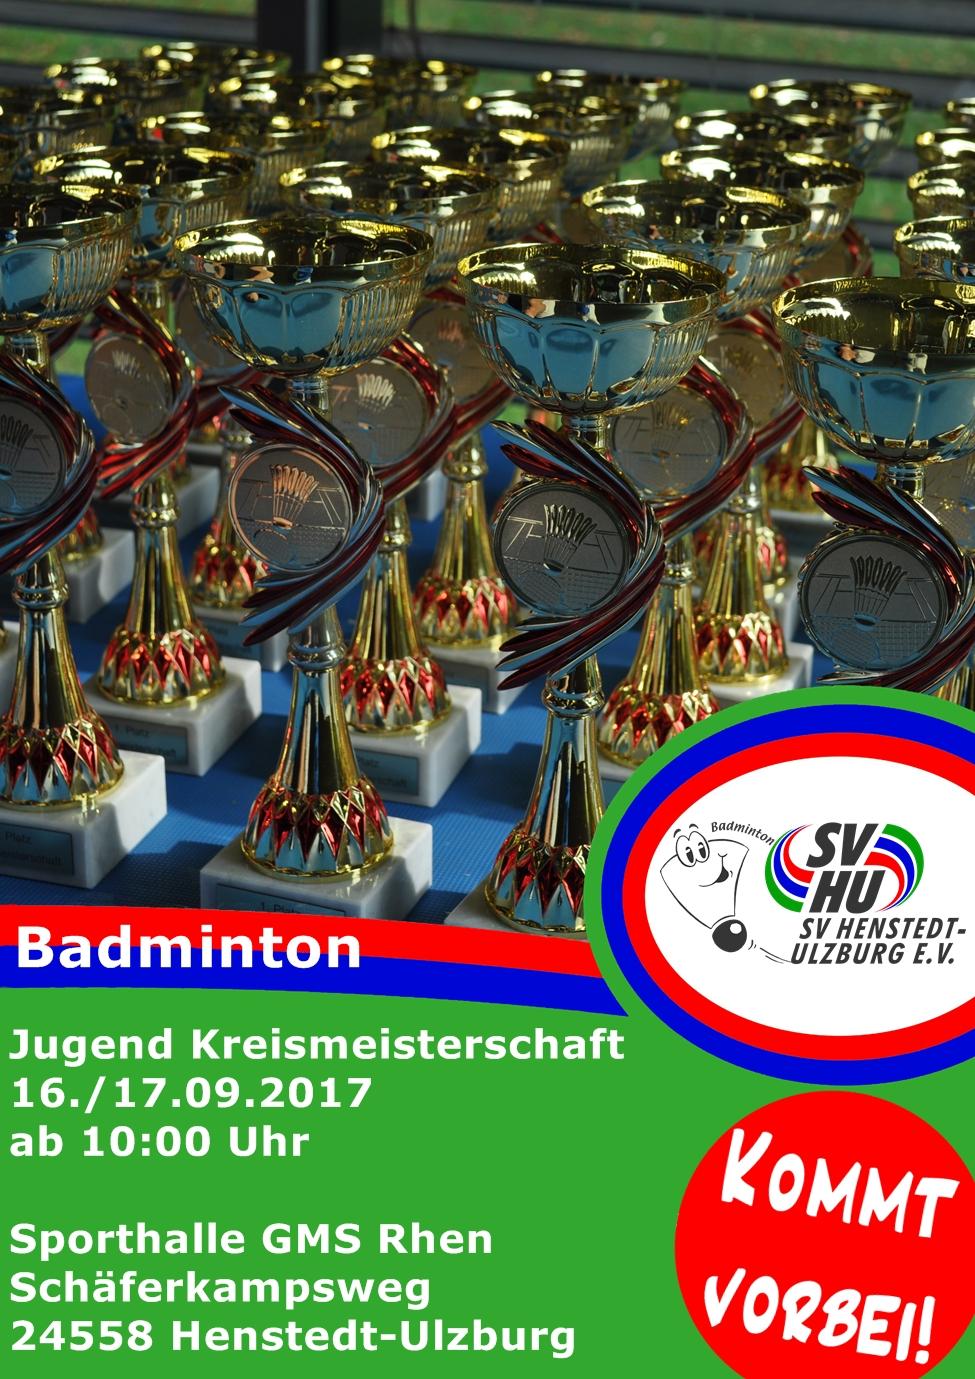 badminton jugendkreismeisterschaften sportverein. Black Bedroom Furniture Sets. Home Design Ideas